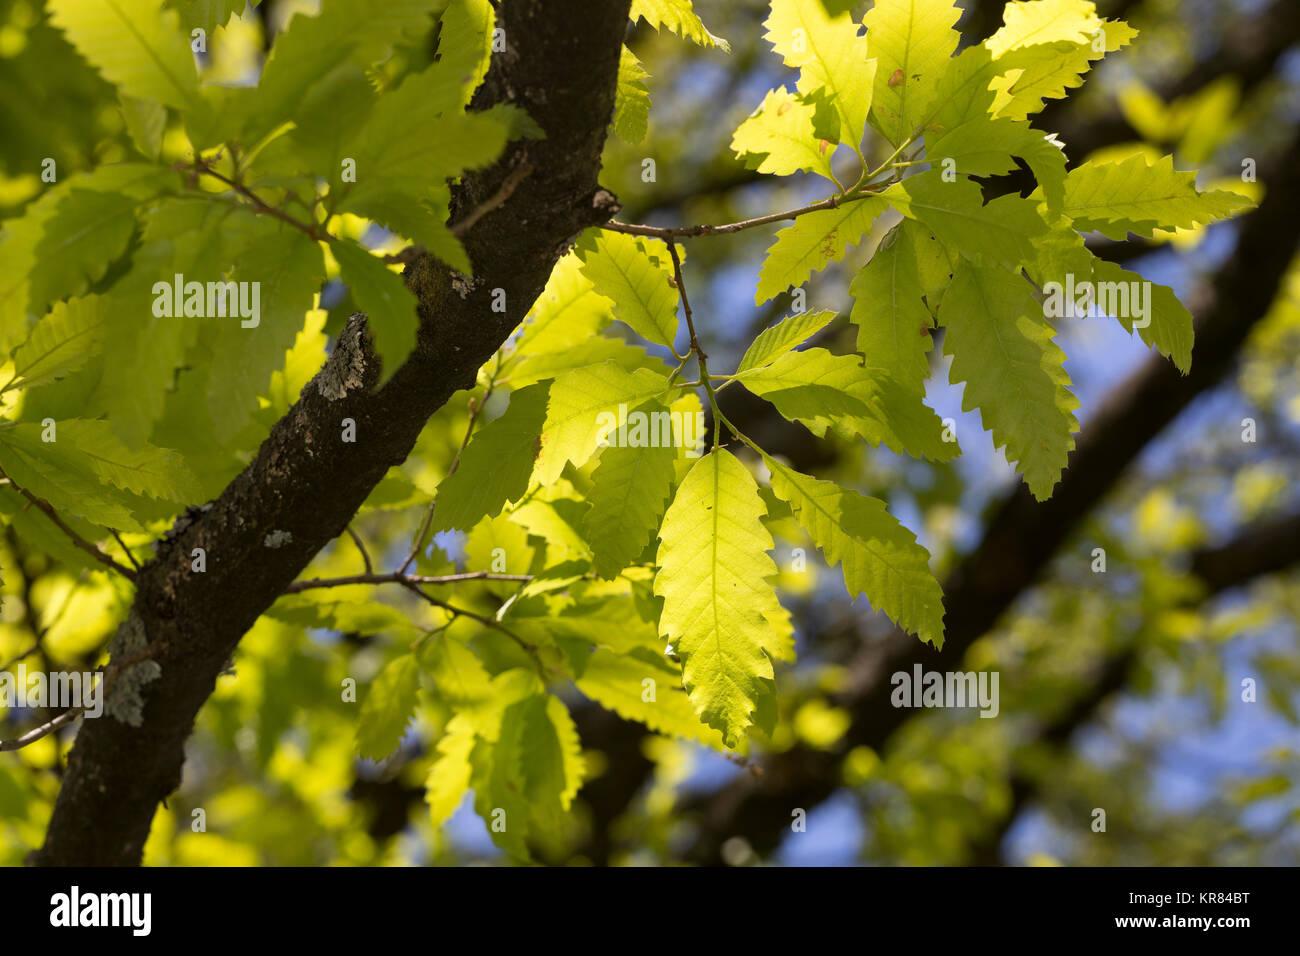 Libanon-Eiche, Libanoneiche, Quercus libani, Quercus vesca, Lebanon oak, Le chêne du Liban - Stock Image